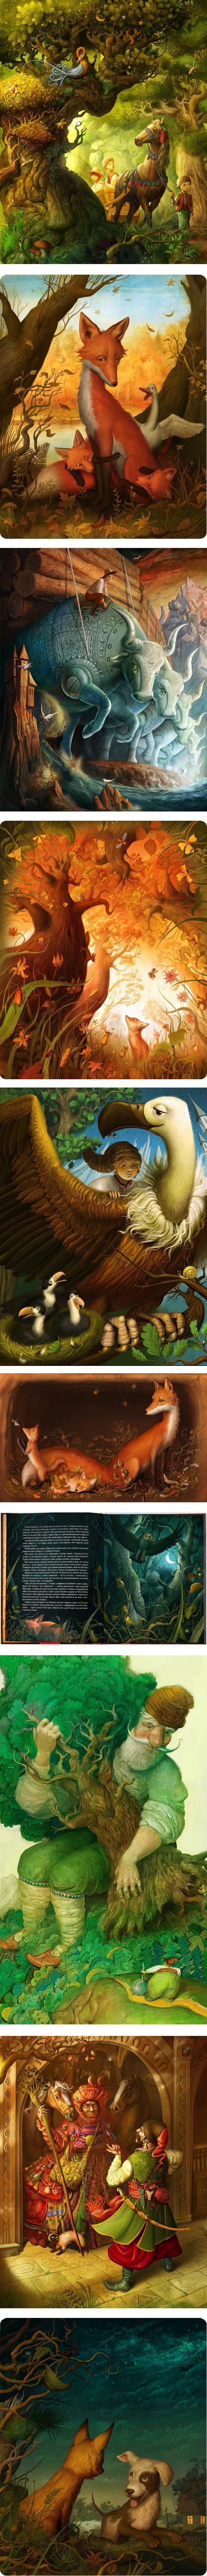 Ivan Sulima, childrens book illustration